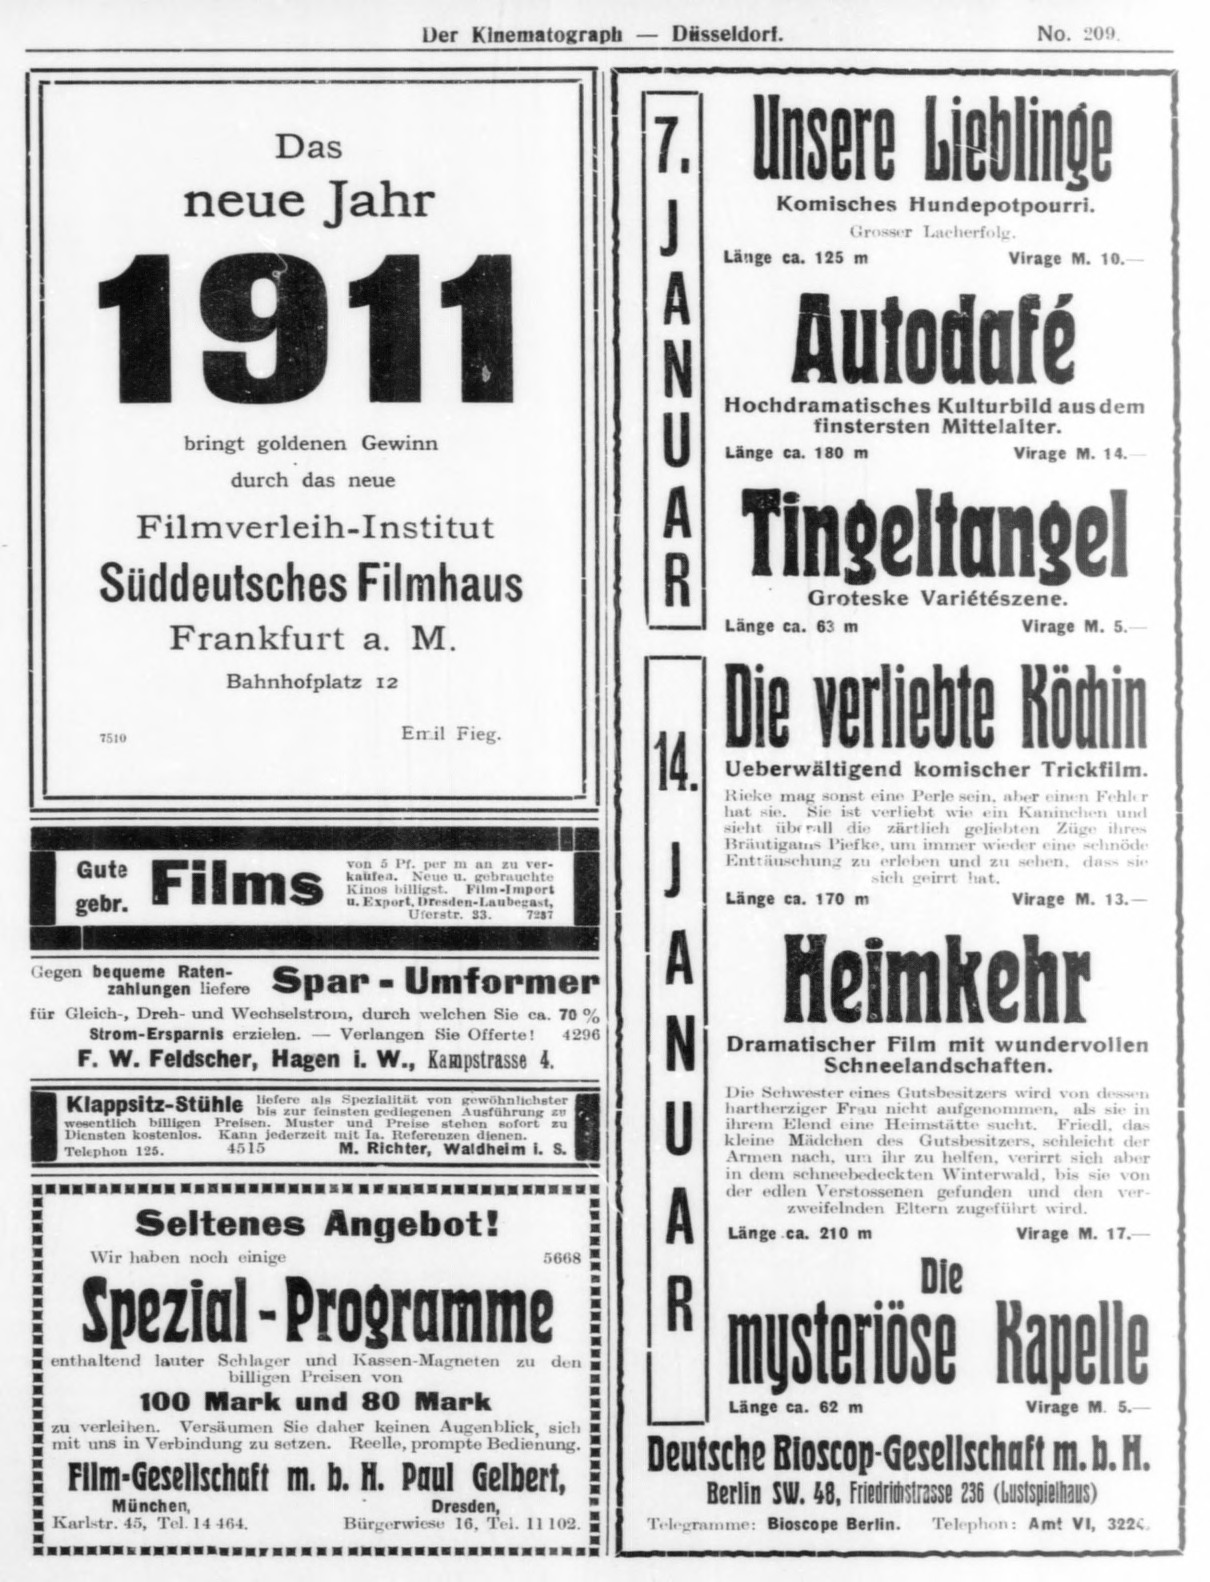 Kinematograph04-1910-12_jp2.zip&file=kinematograph04-1910-12_jp2%2fkinematograph04-1910-12_0096